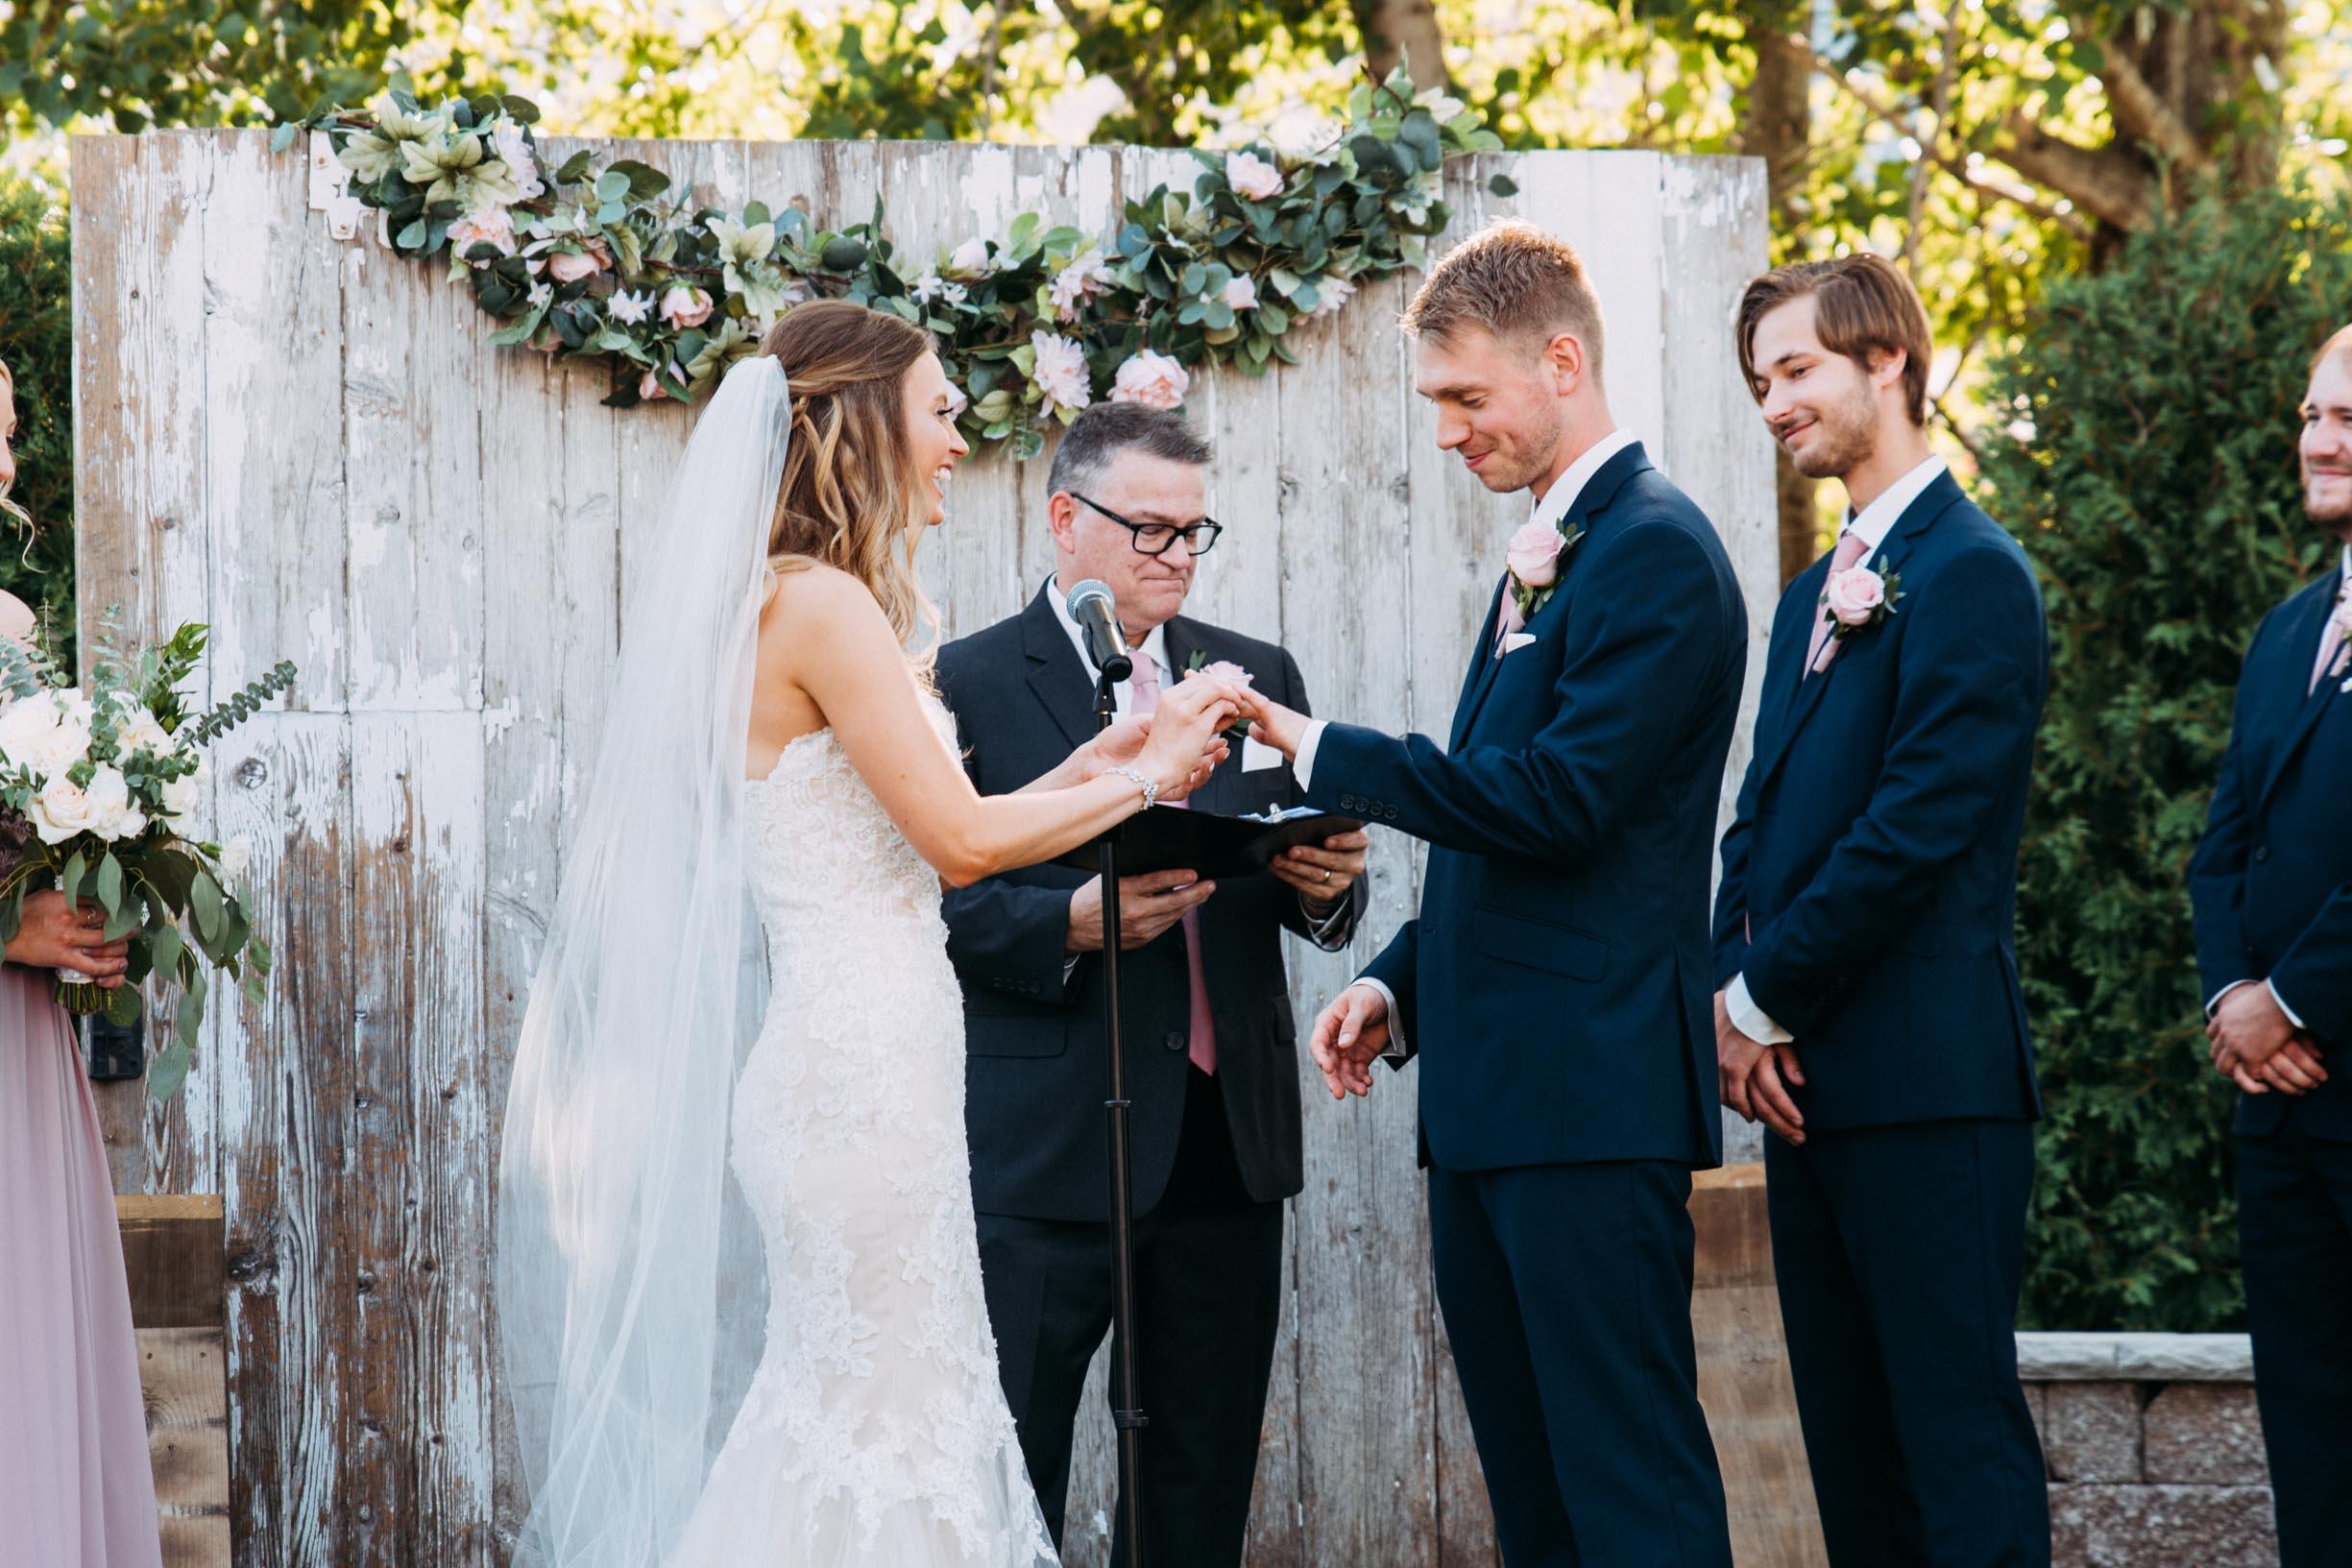 59-WeddingsattheBroz_Minnesota_WeddingBlog_Ceremony.jpg